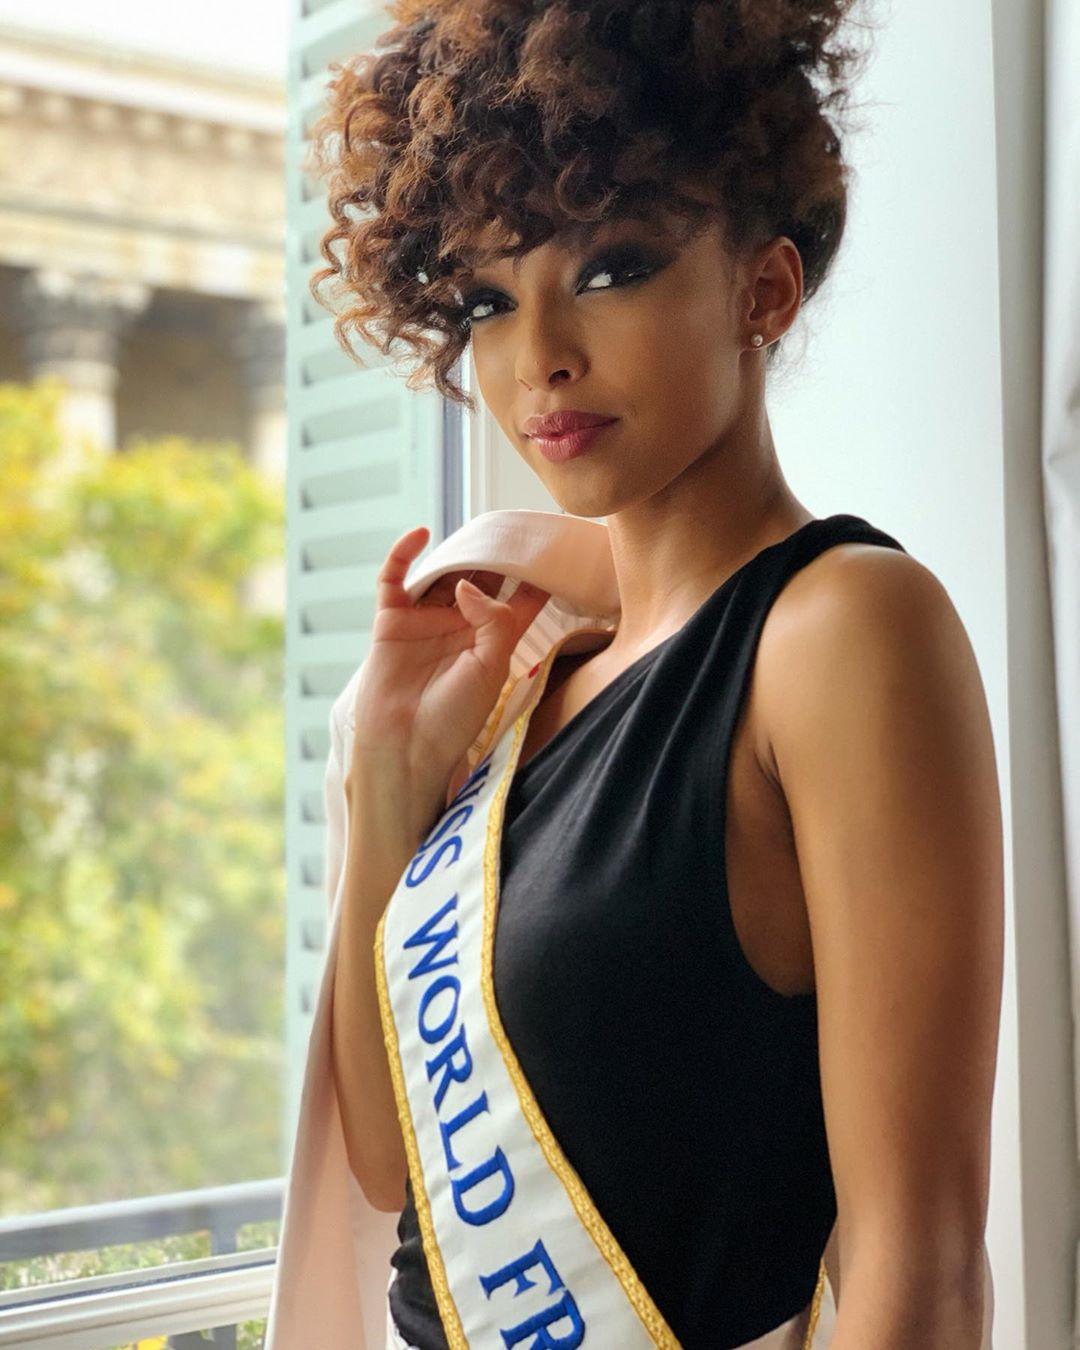 candidatas a miss world 2019. final: 14 dec. sede: london. - Página 3 I1R1Wb